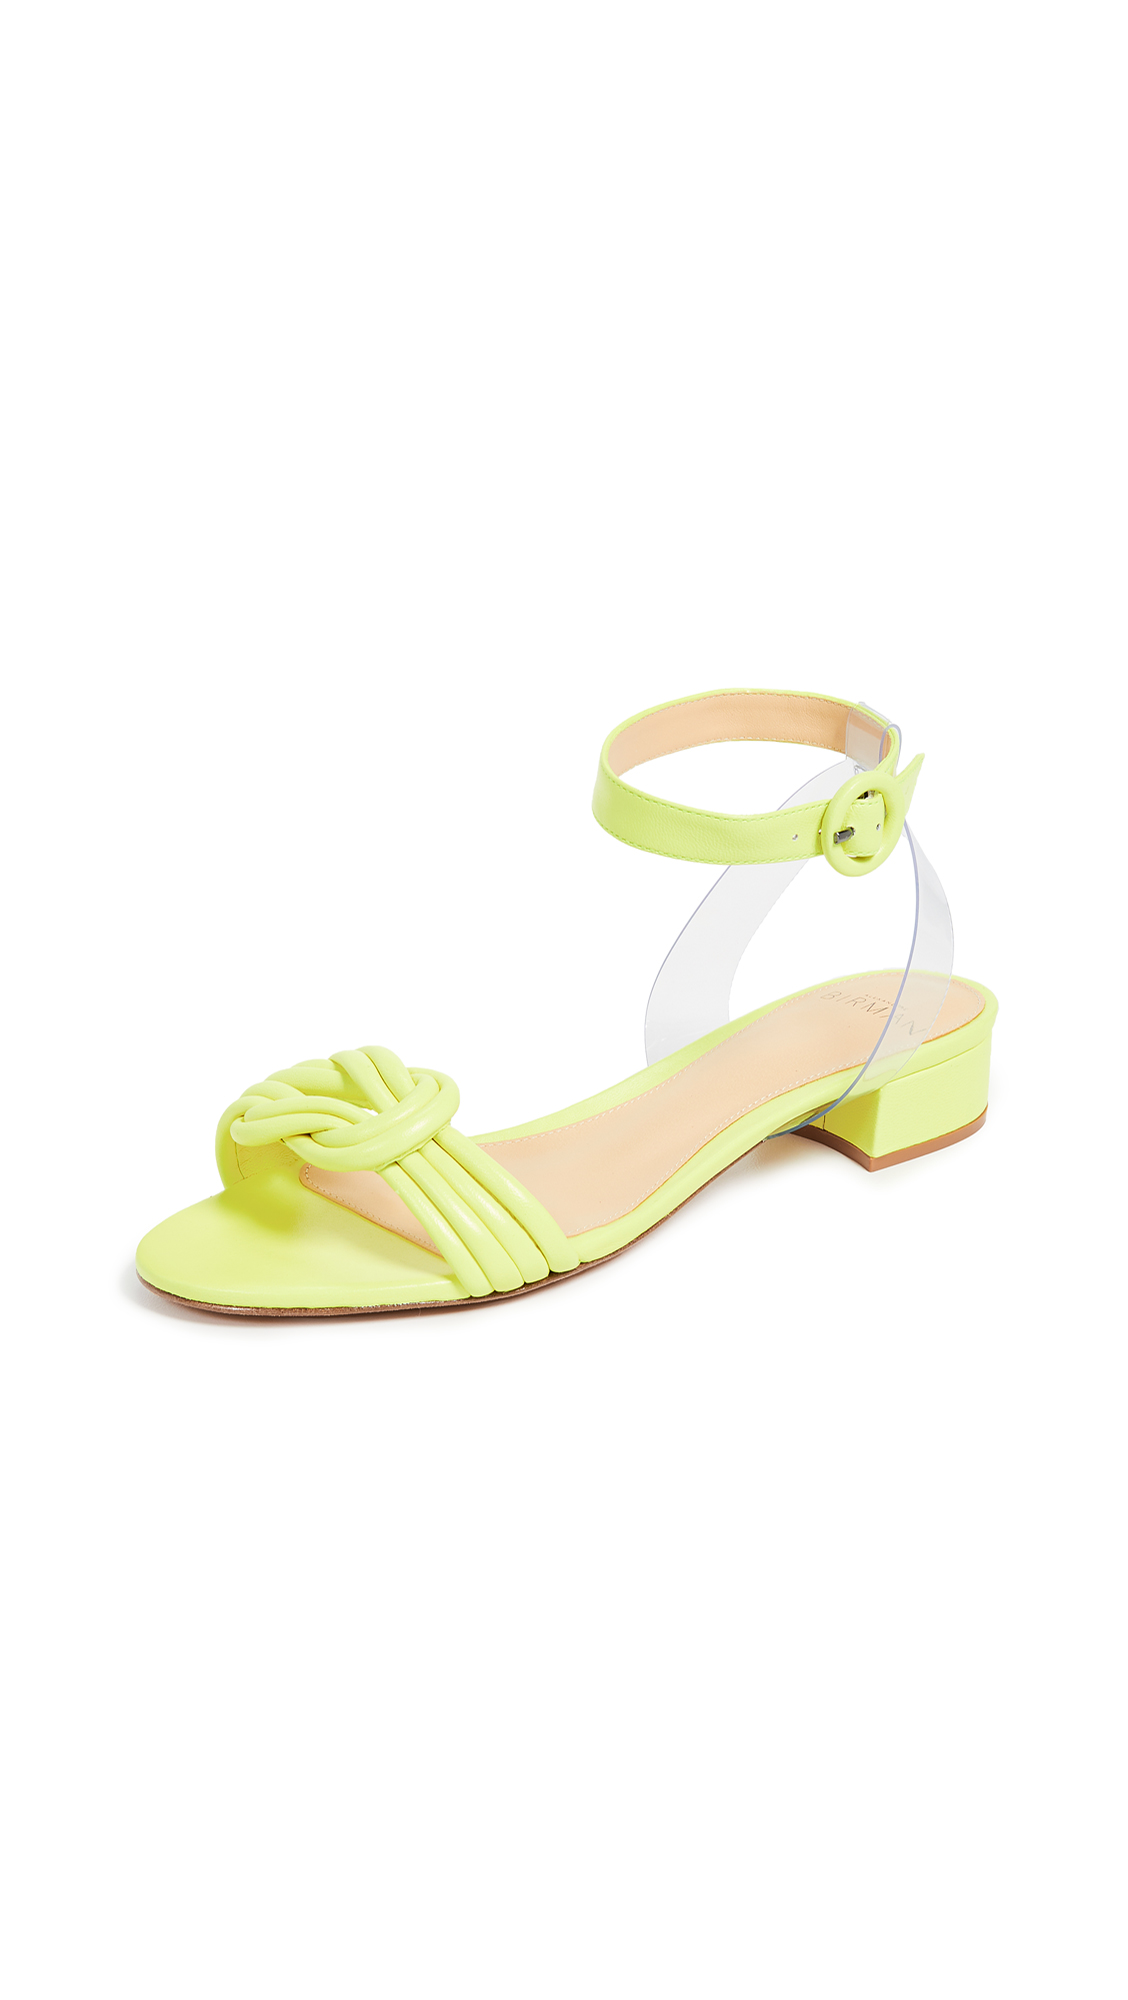 Alexandre Birman Vicky Vinyl 30mm Sandals - Yellow Fluo/Transparent